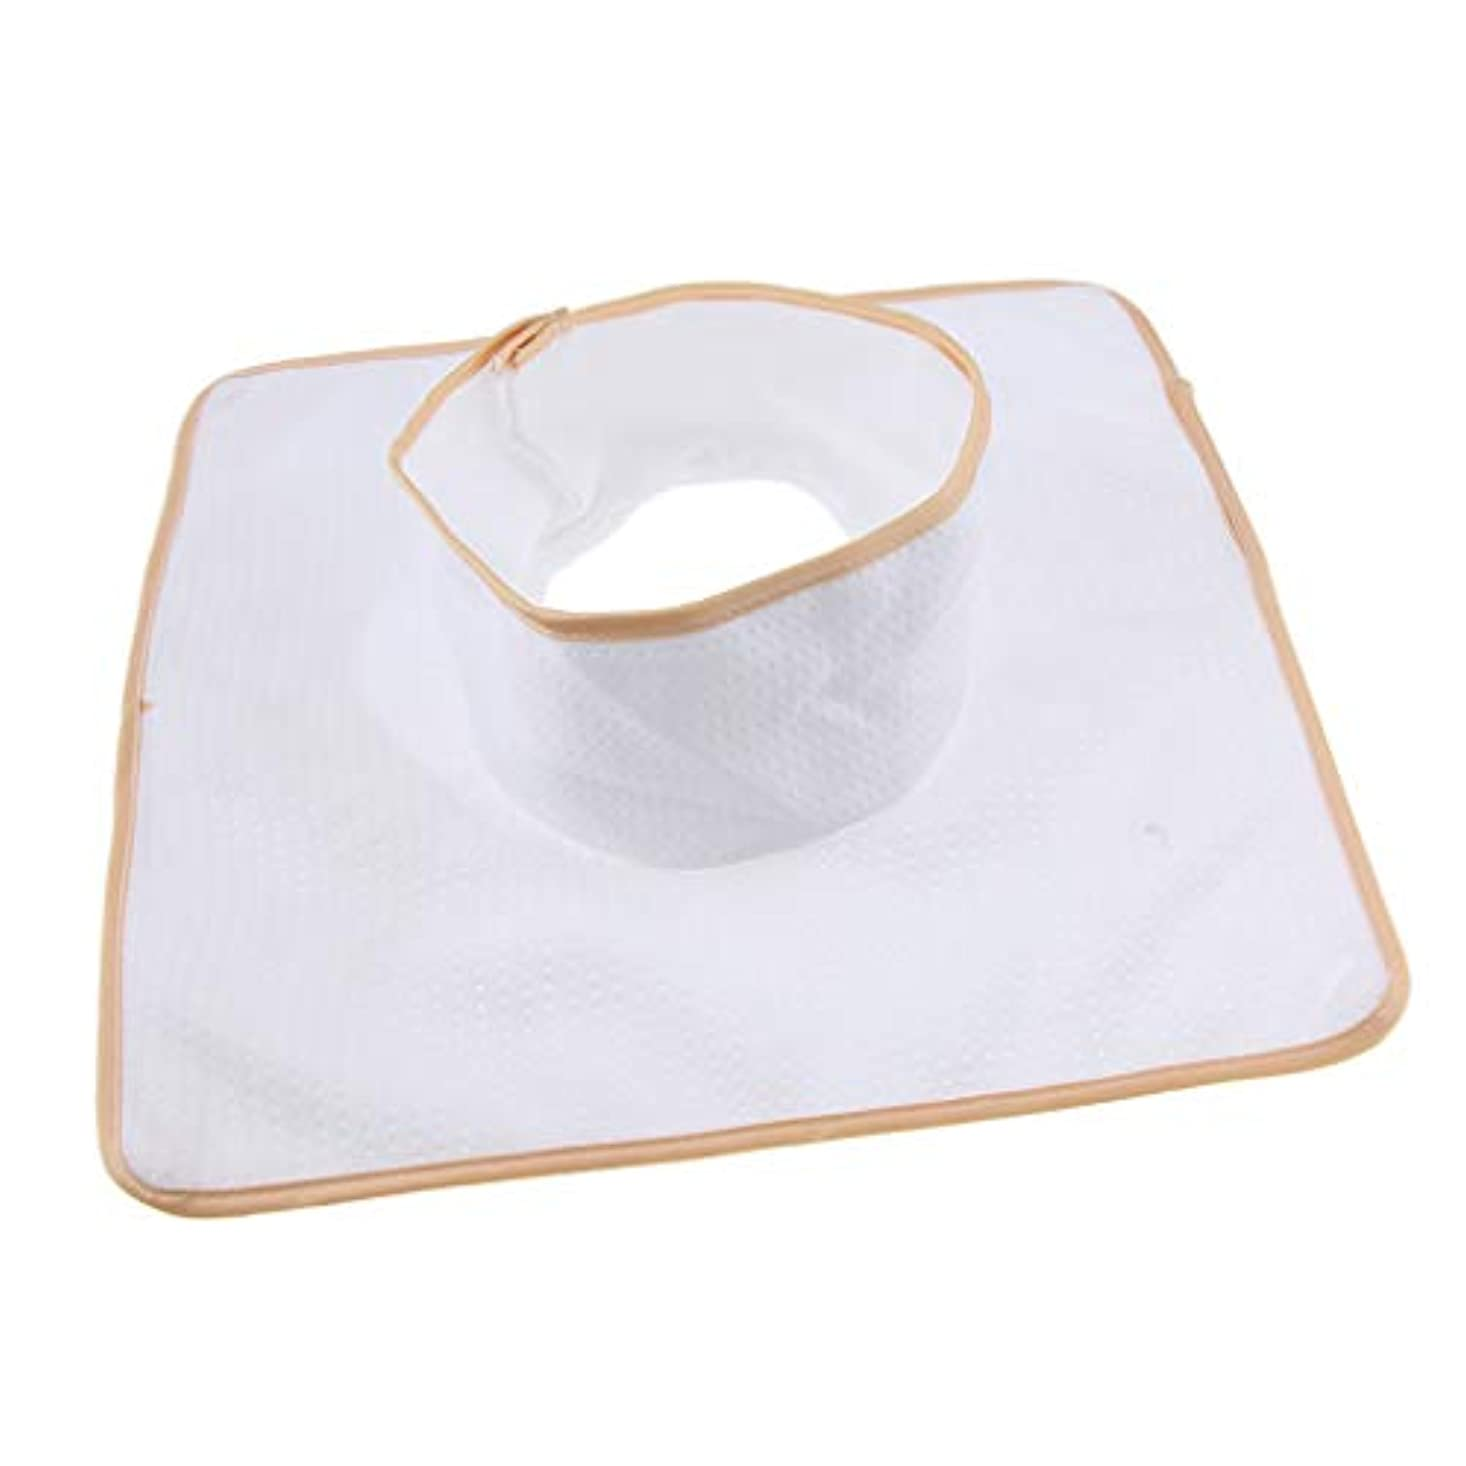 D DOLITY マッサージ ベッド テーブル ヘッドパッド 頭の穴付 再使用可能 約35×35cm 全3色 - 白